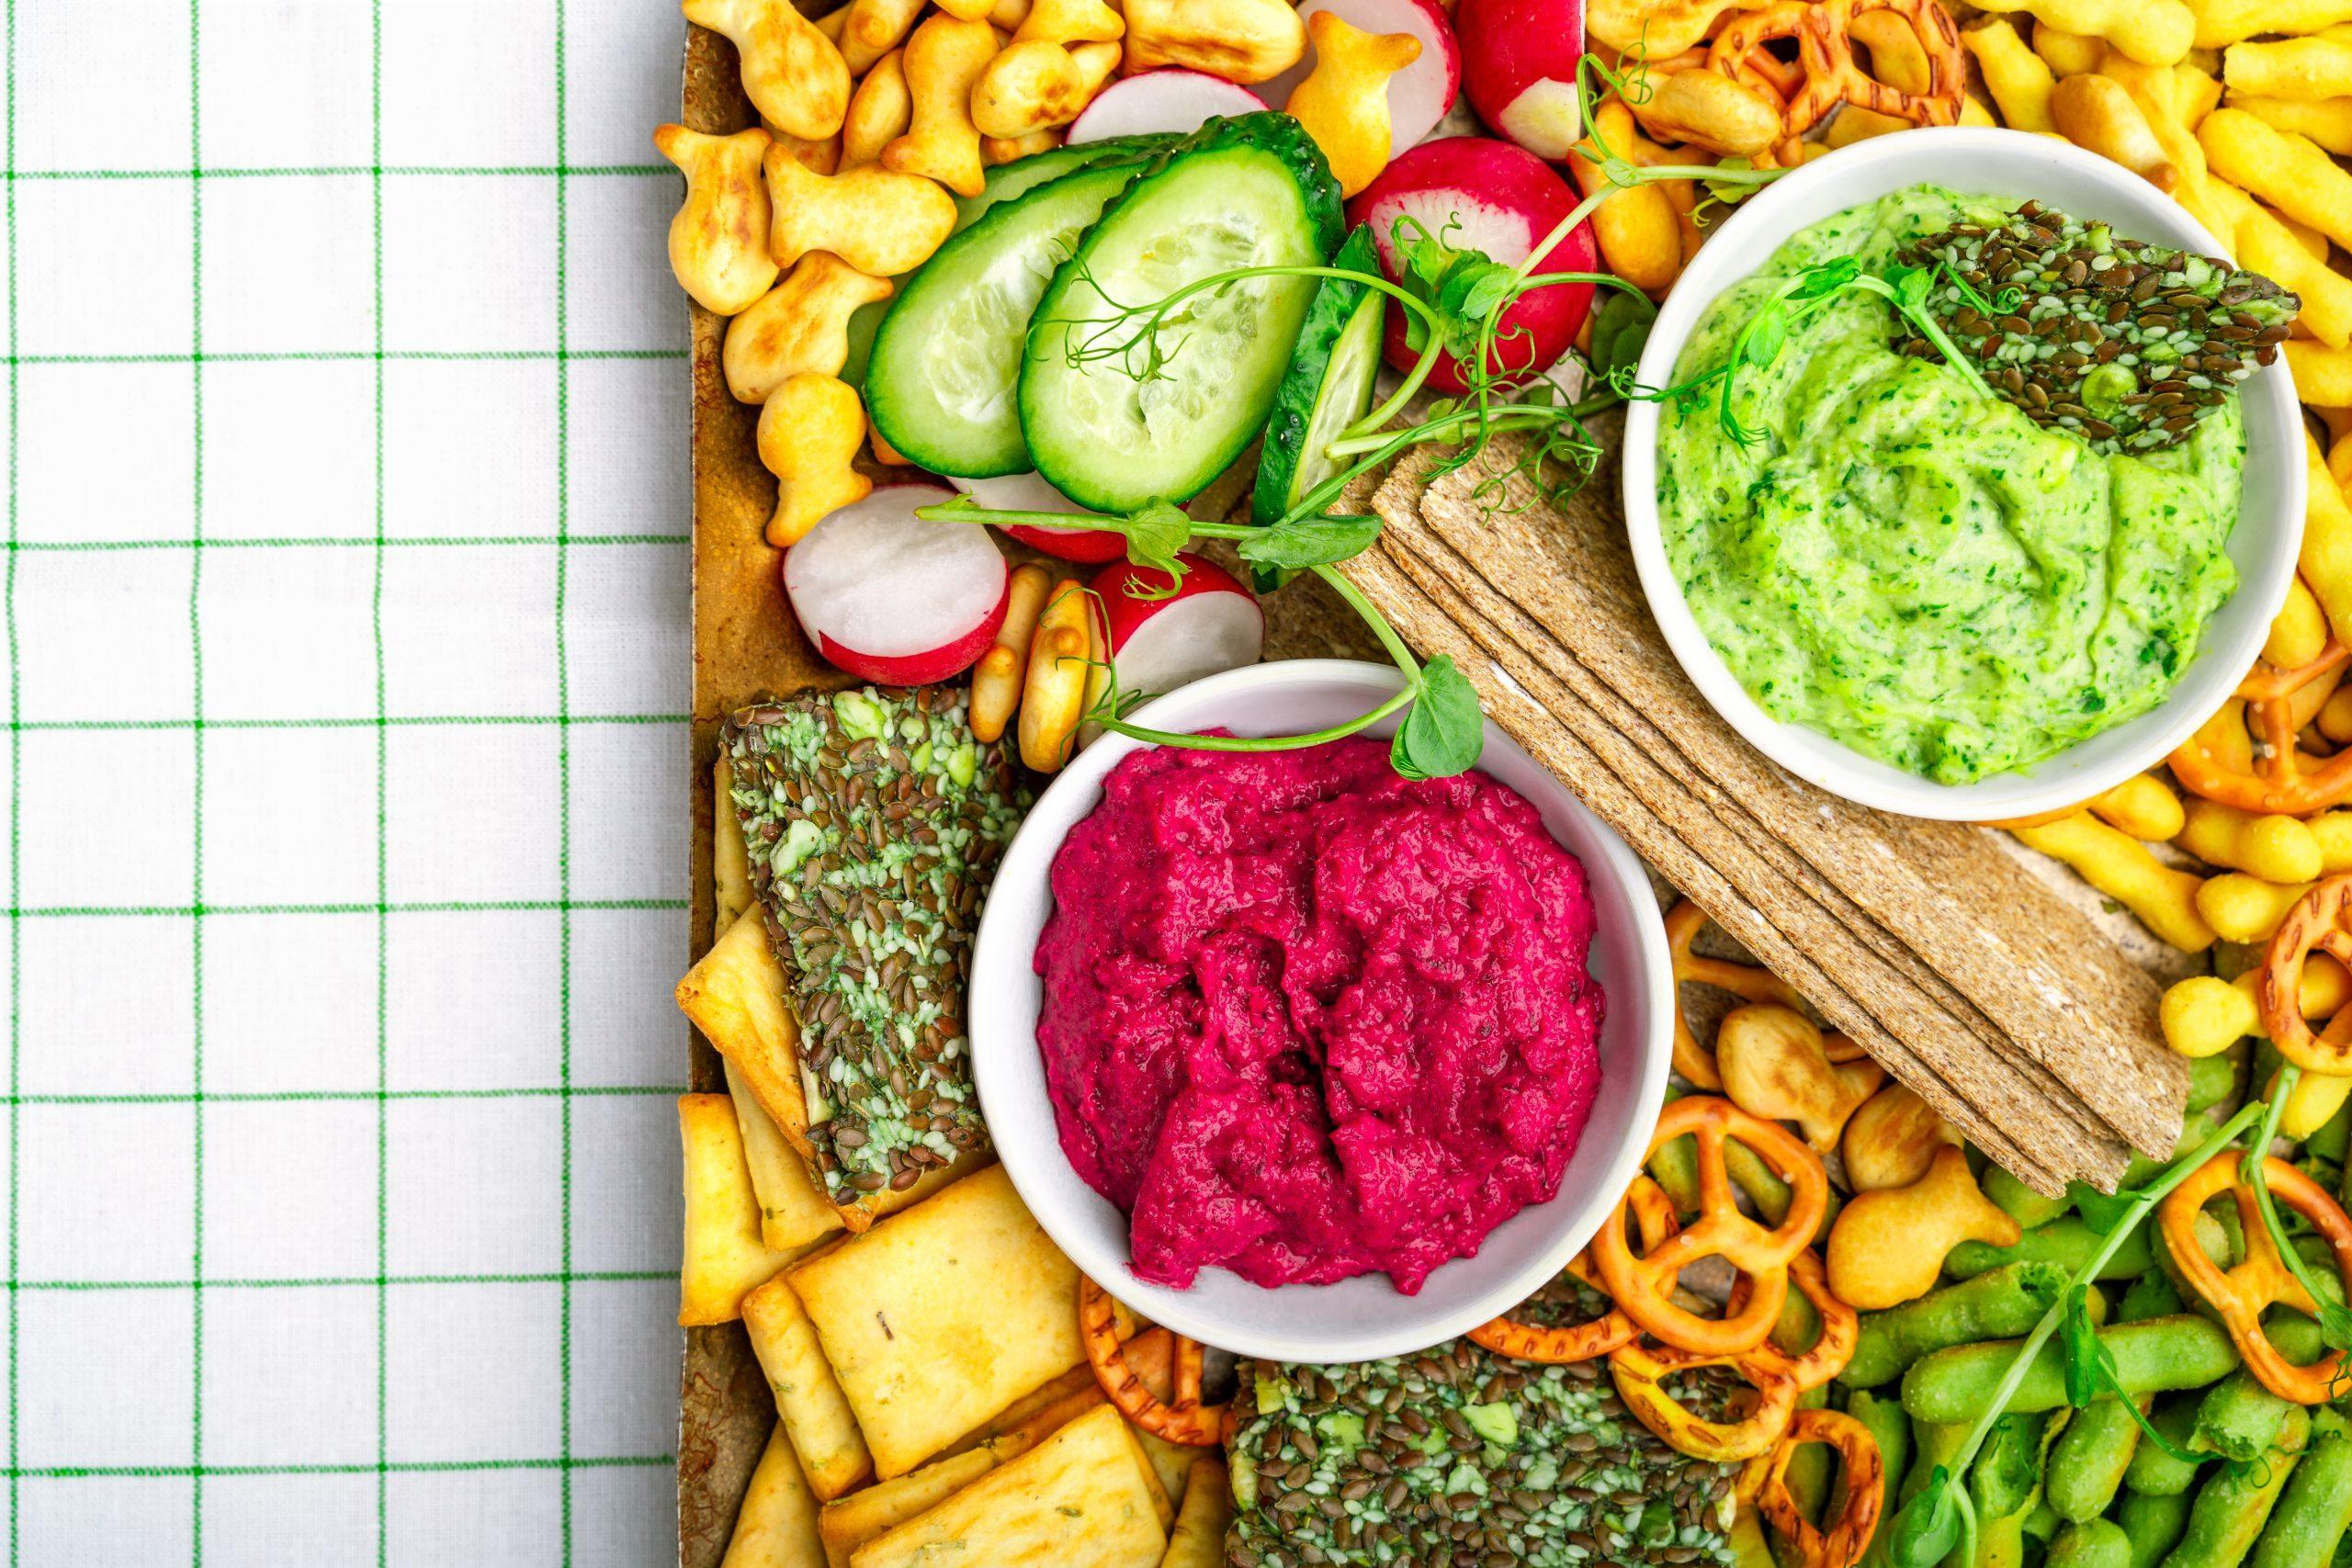 Vegan food on a kosher charcutier board.